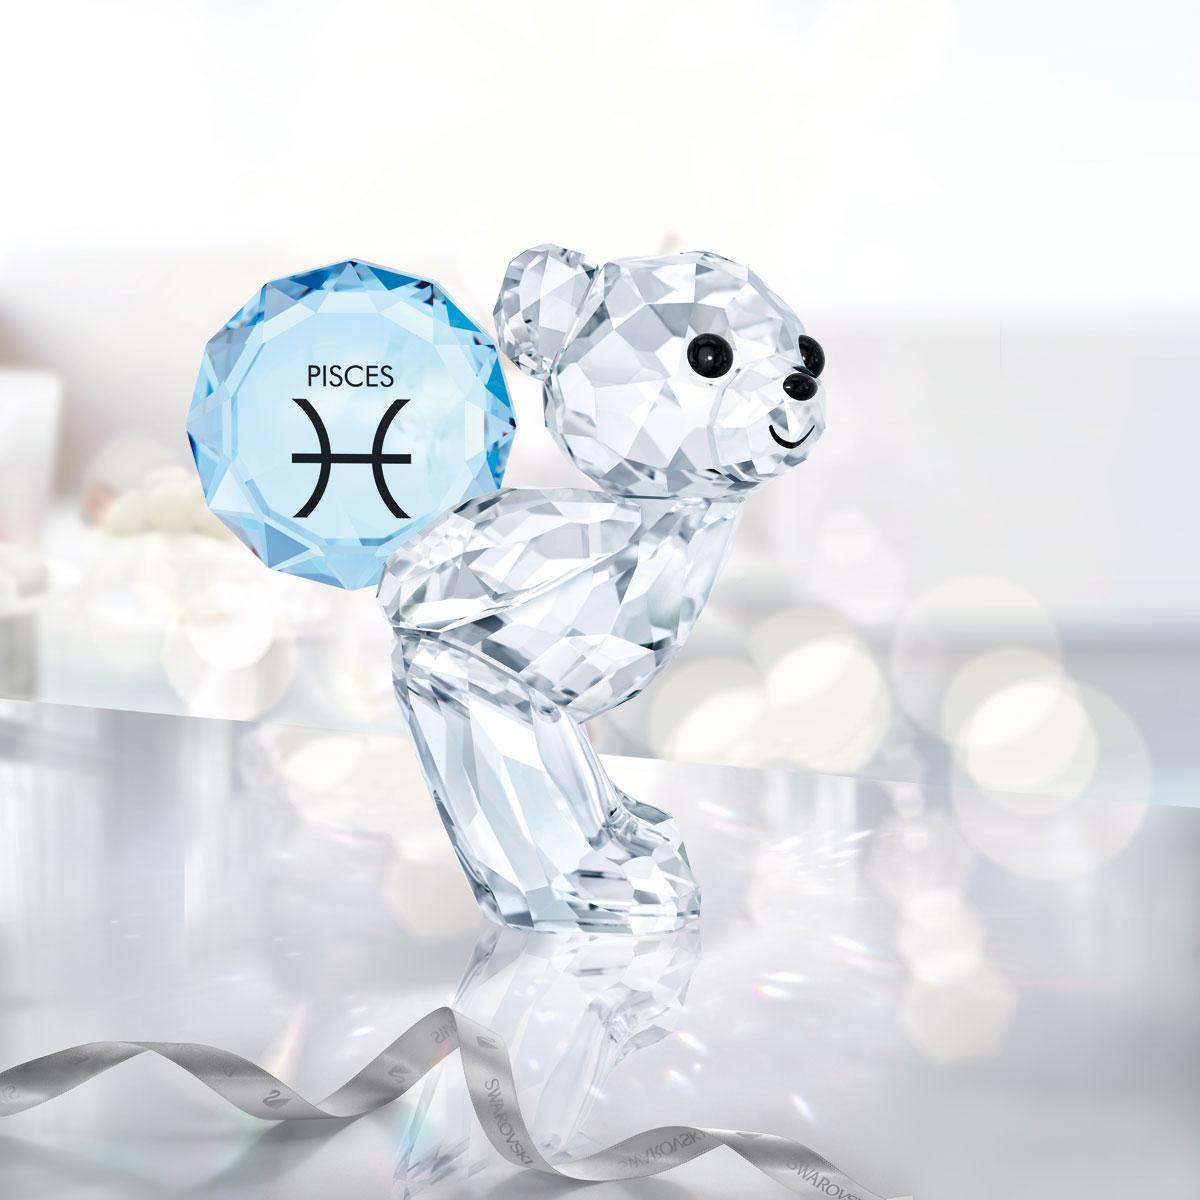 Swarovski Crystal Kris Bear Horoscope Pisces Crystal Sculpture